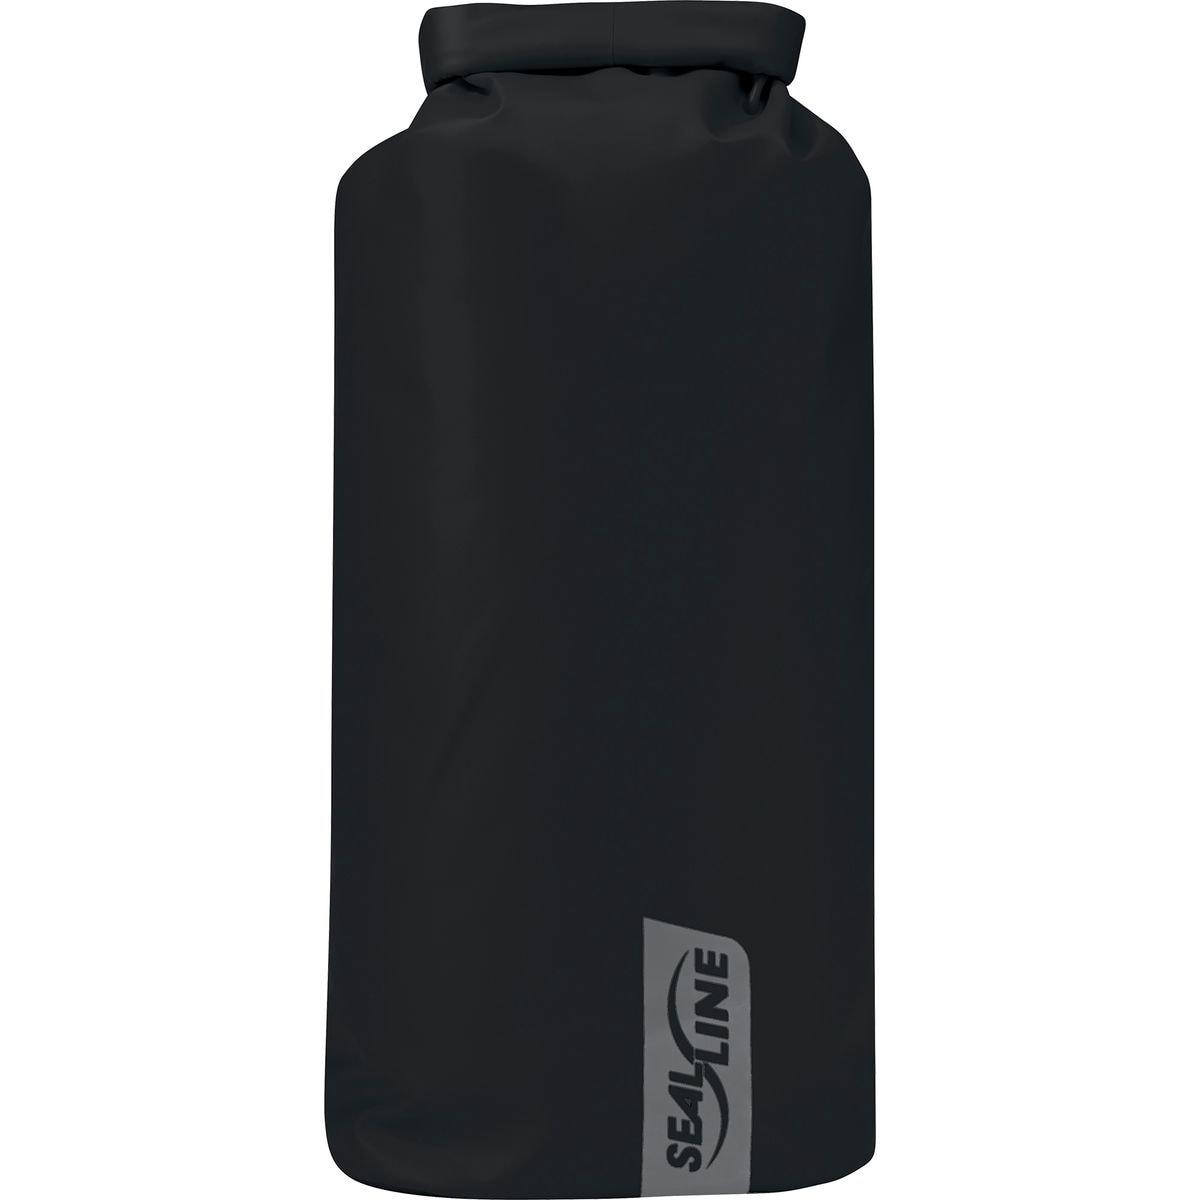 SealLine Discovery Dry Bag Black, 30L